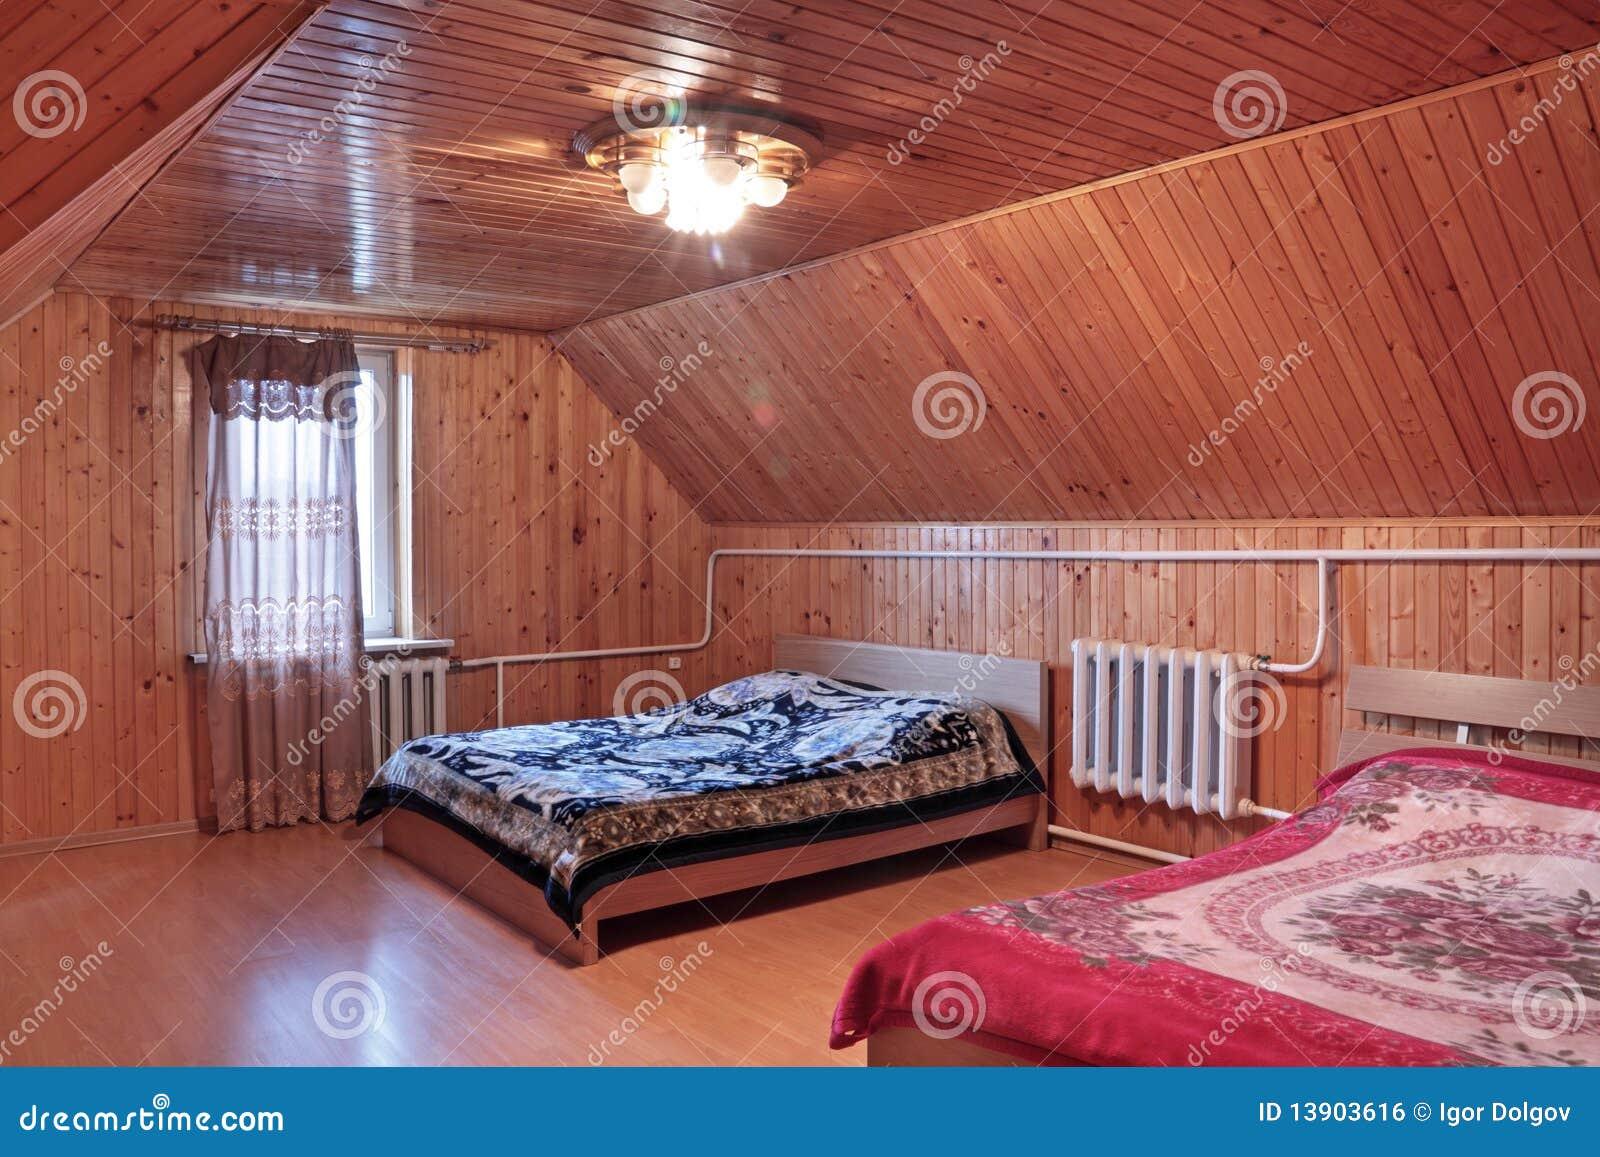 Mansard room royalty free stock image image 13903616 for Mansard room